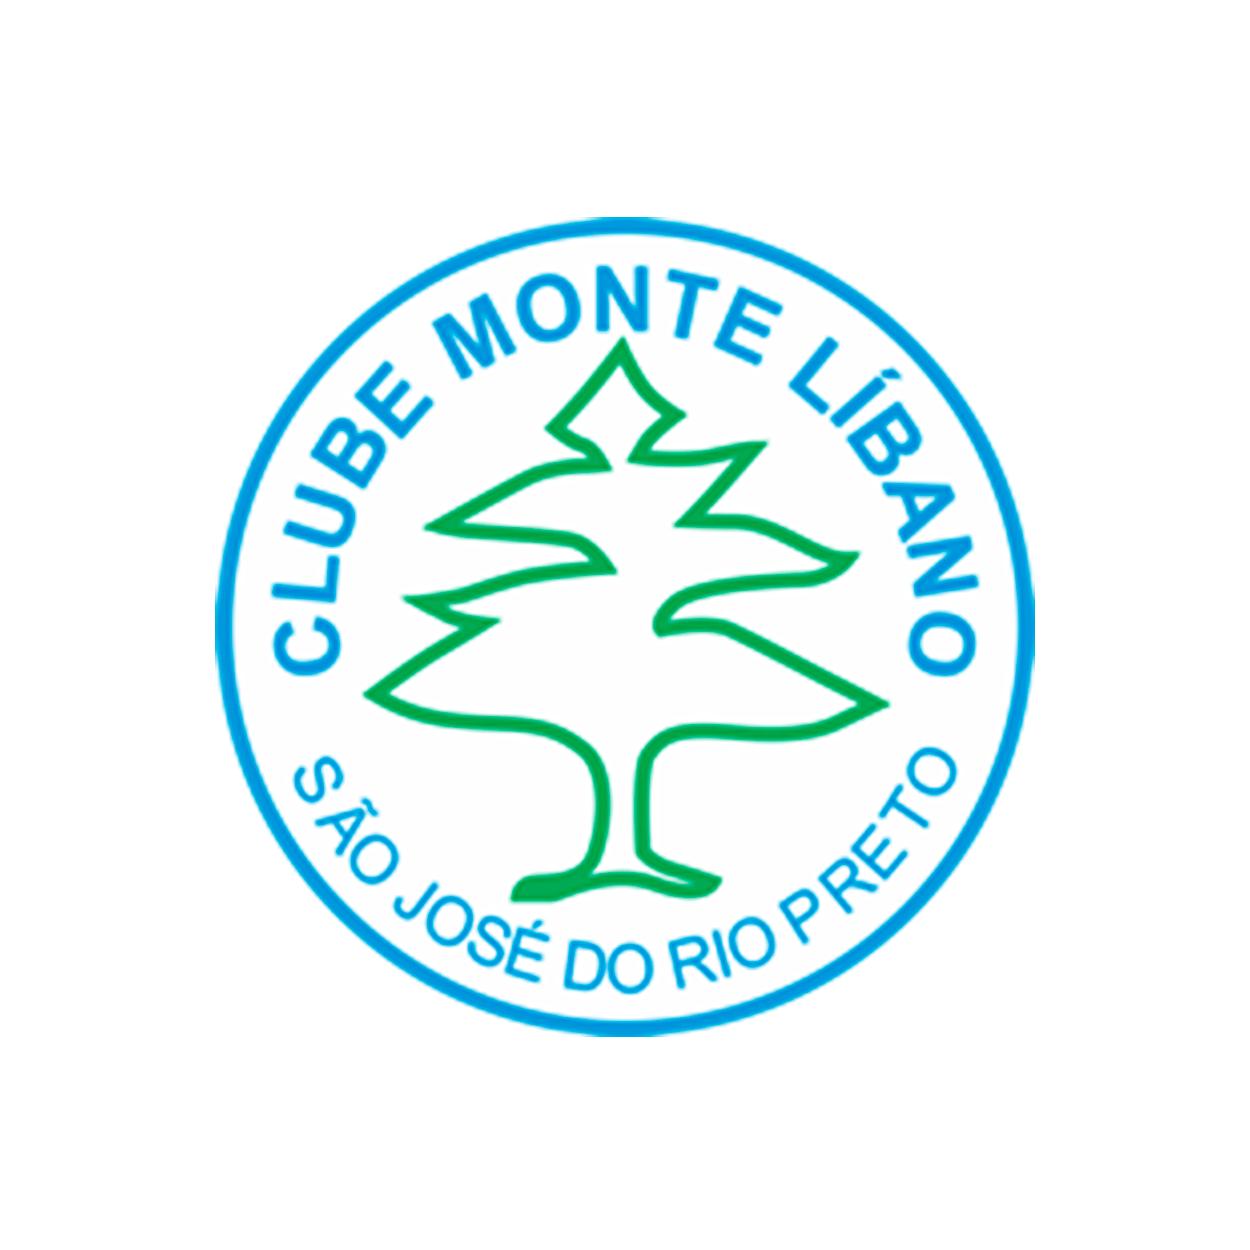 CLUBE MONTE LIBANO SJRP